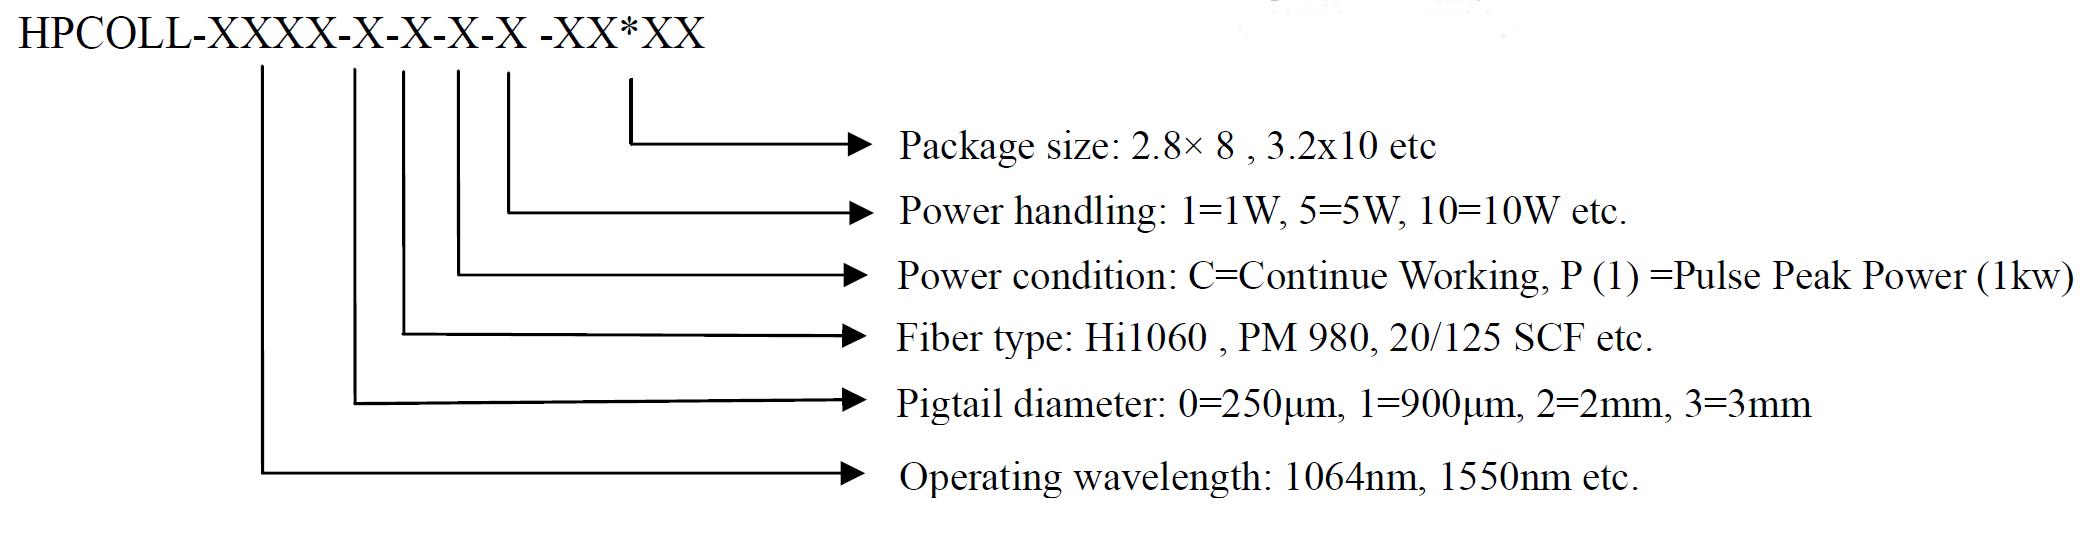 High Power Collimator